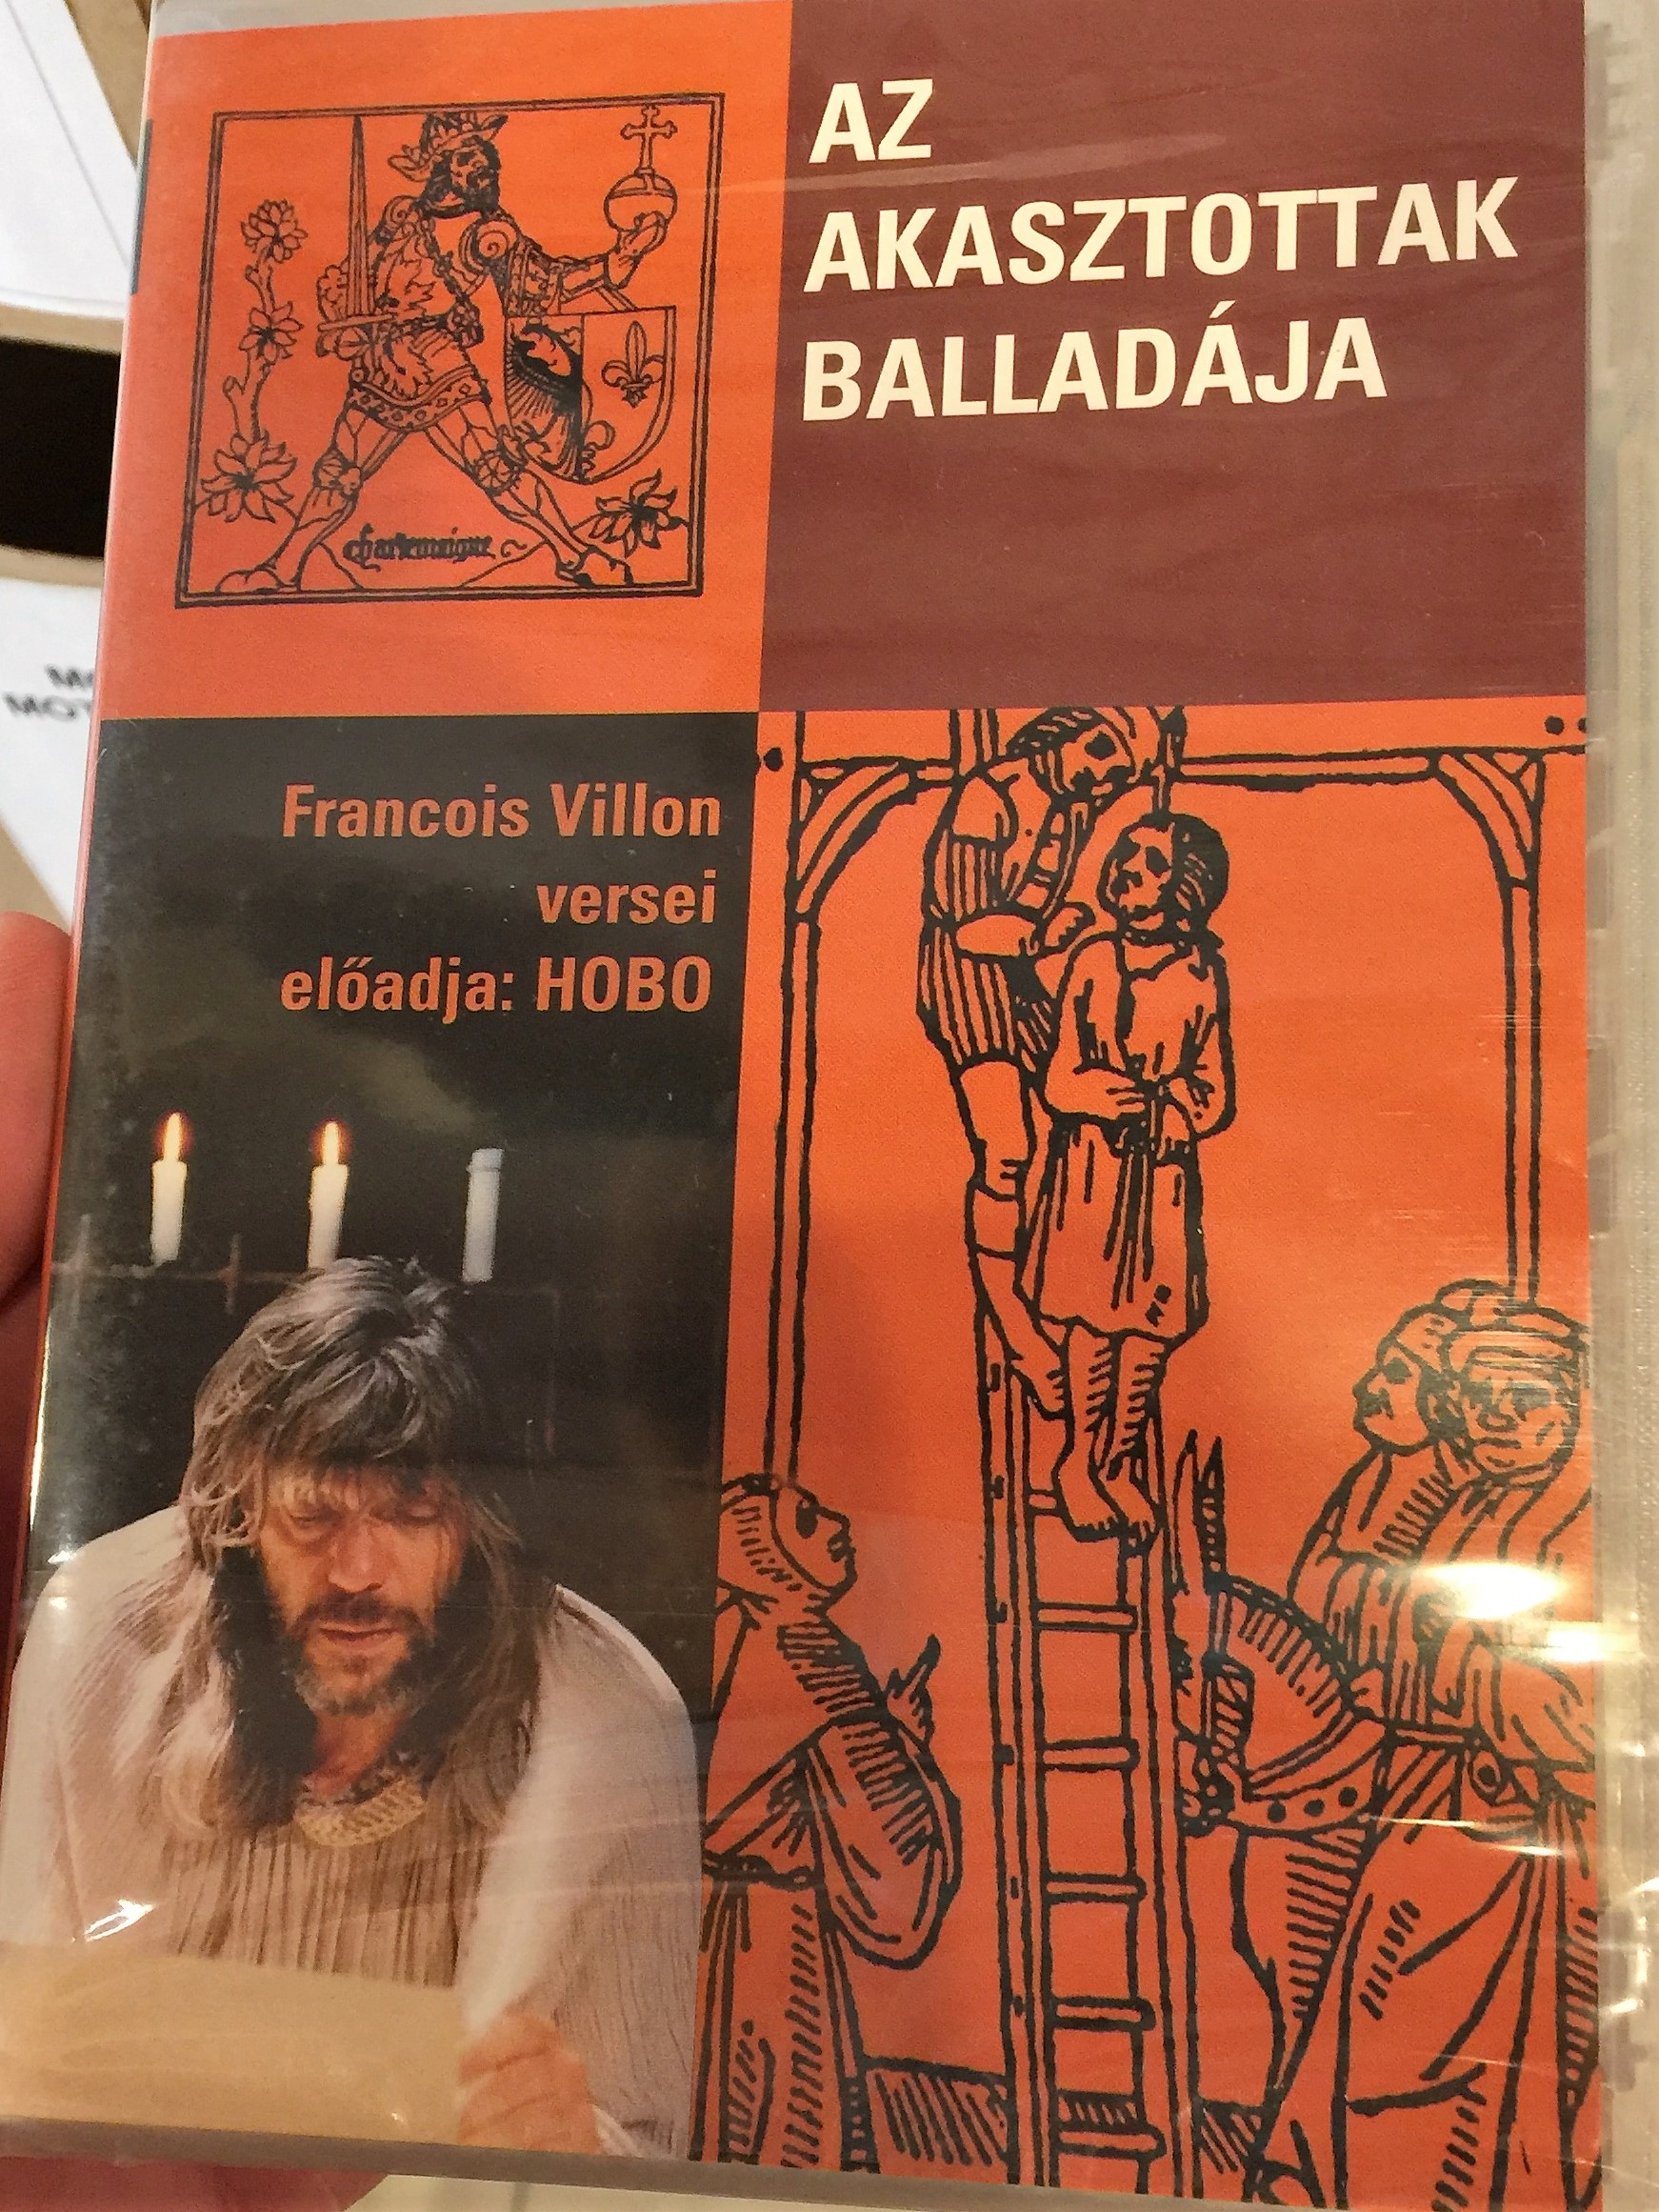 az-akasztottak-ballad-ja-dvd-2006-francois-villon-versei-el-adja-hobo-poems-of-francois-villon-in-hungarian-language-presented-by-f-ldes-l-szl-hobo-1-.jpg